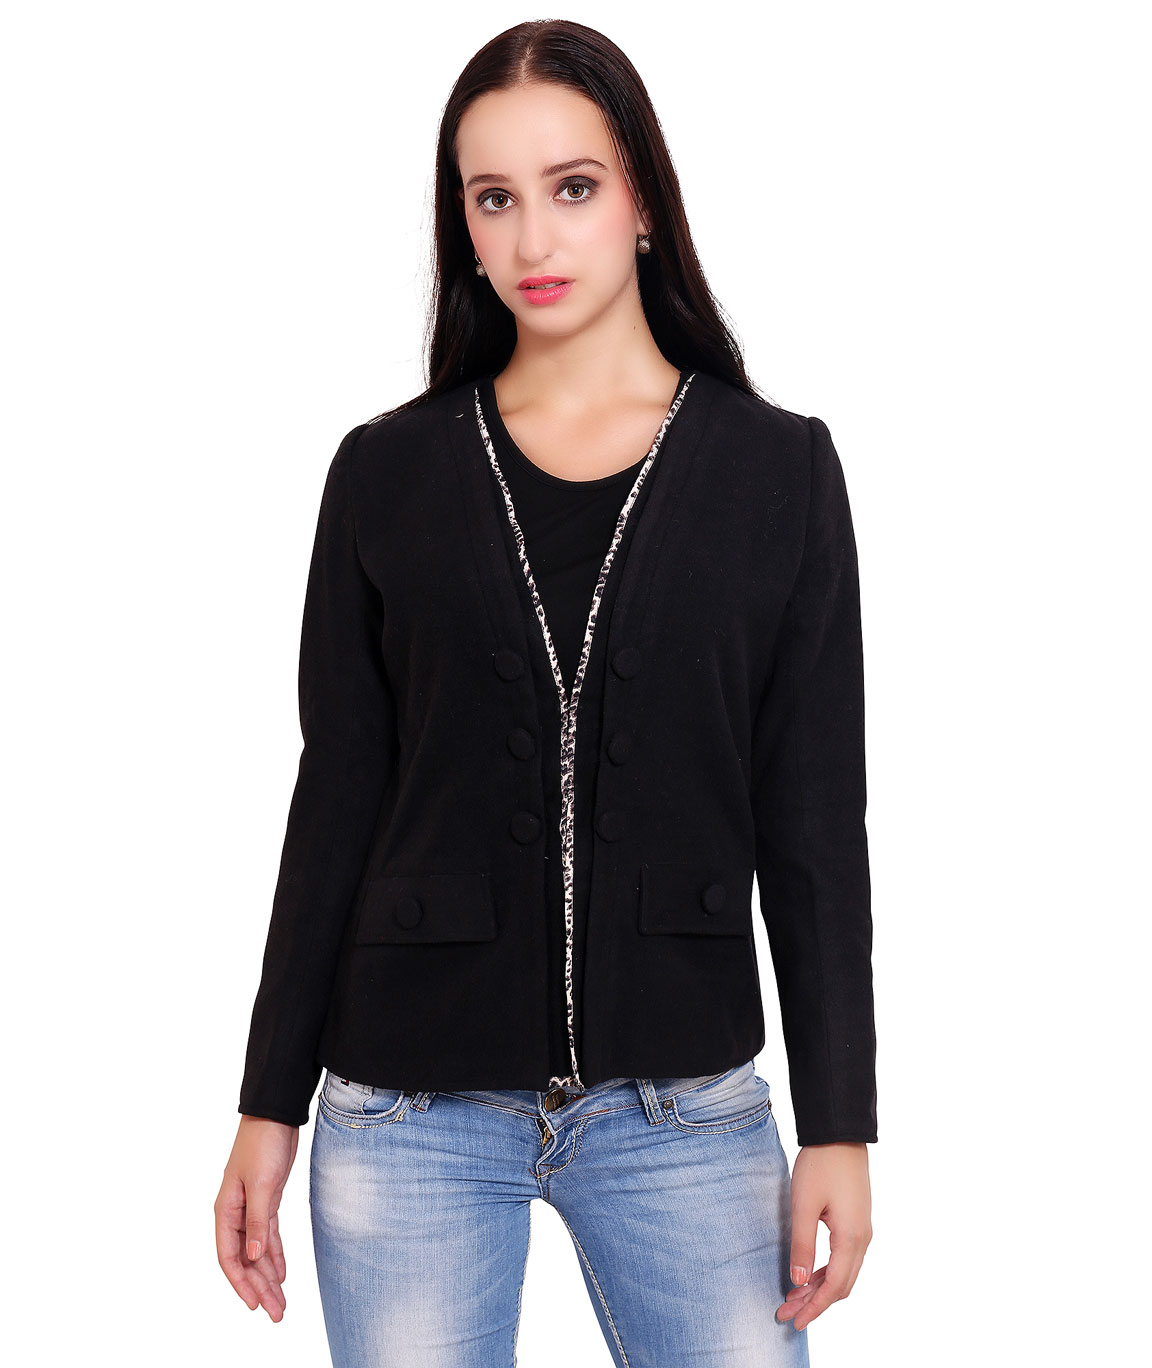 FAZZN Short Woolen Coats(Black)